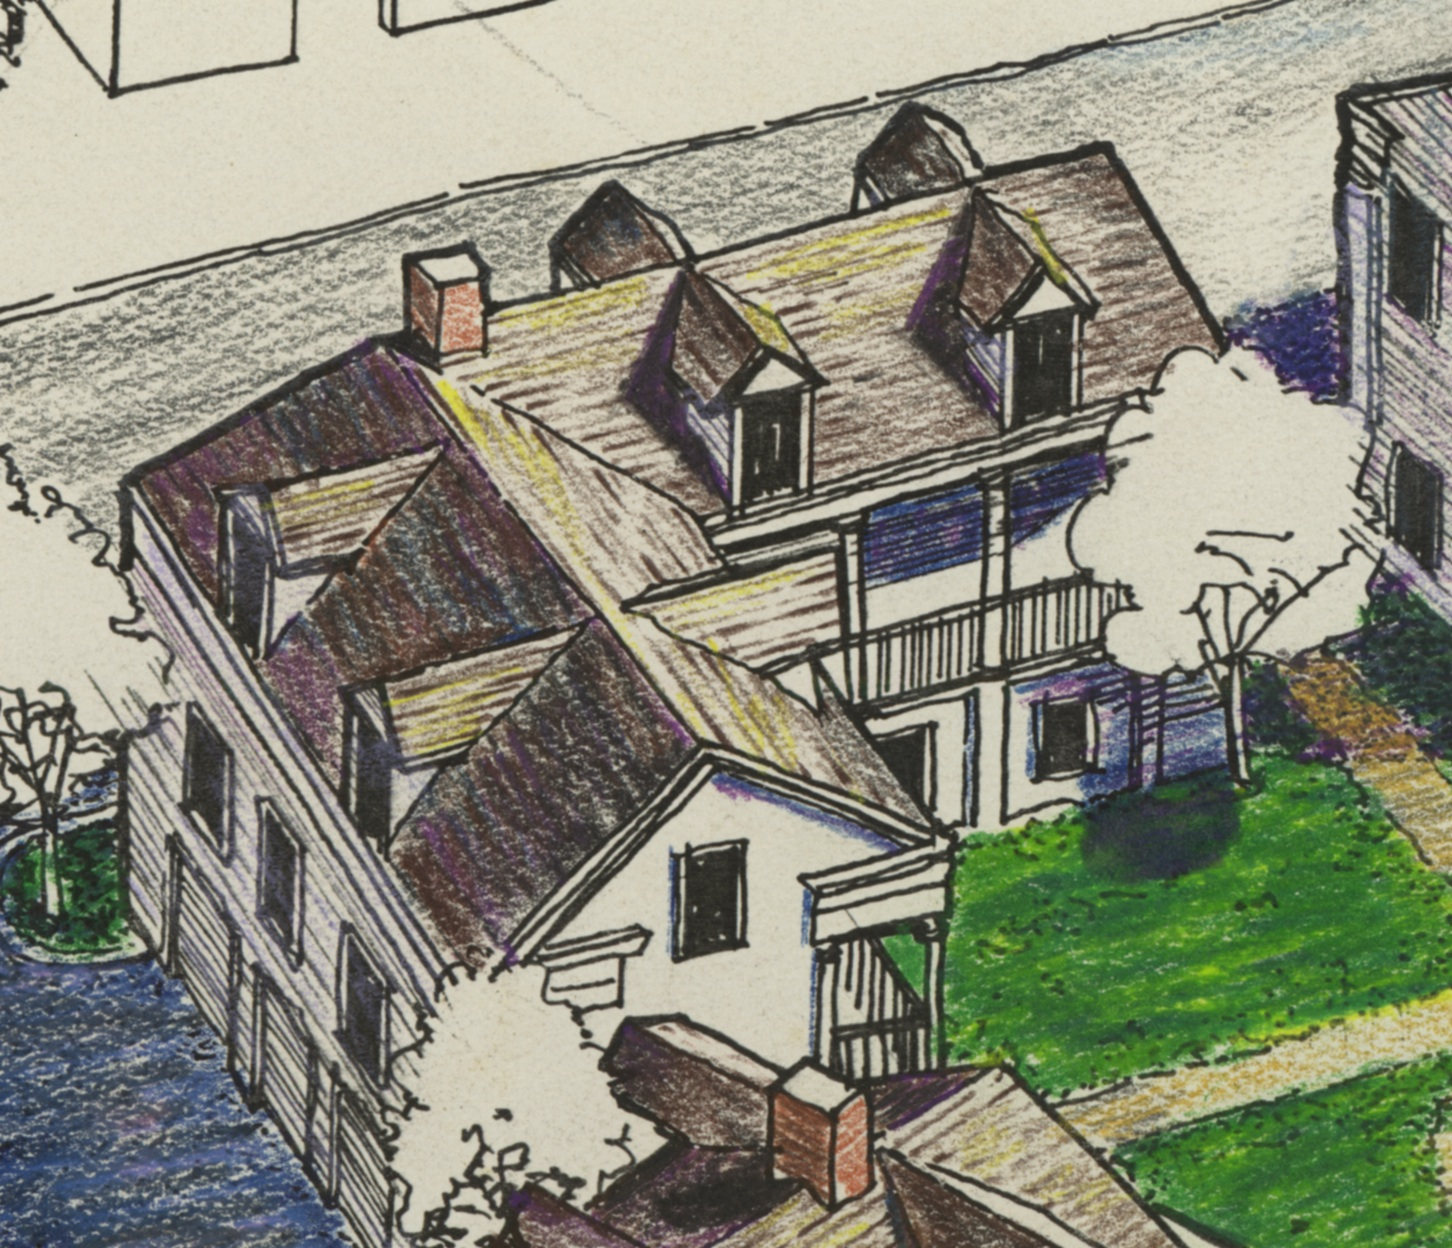 Mystic_Connecticut.Cottrell_Landing_Development.Neighborhood_Planning.Walkable.Robert_Orr_&_Associates.Architecture.Landscape_Architecture.New_Urbanism.Windom.L_House_Rear.jpg